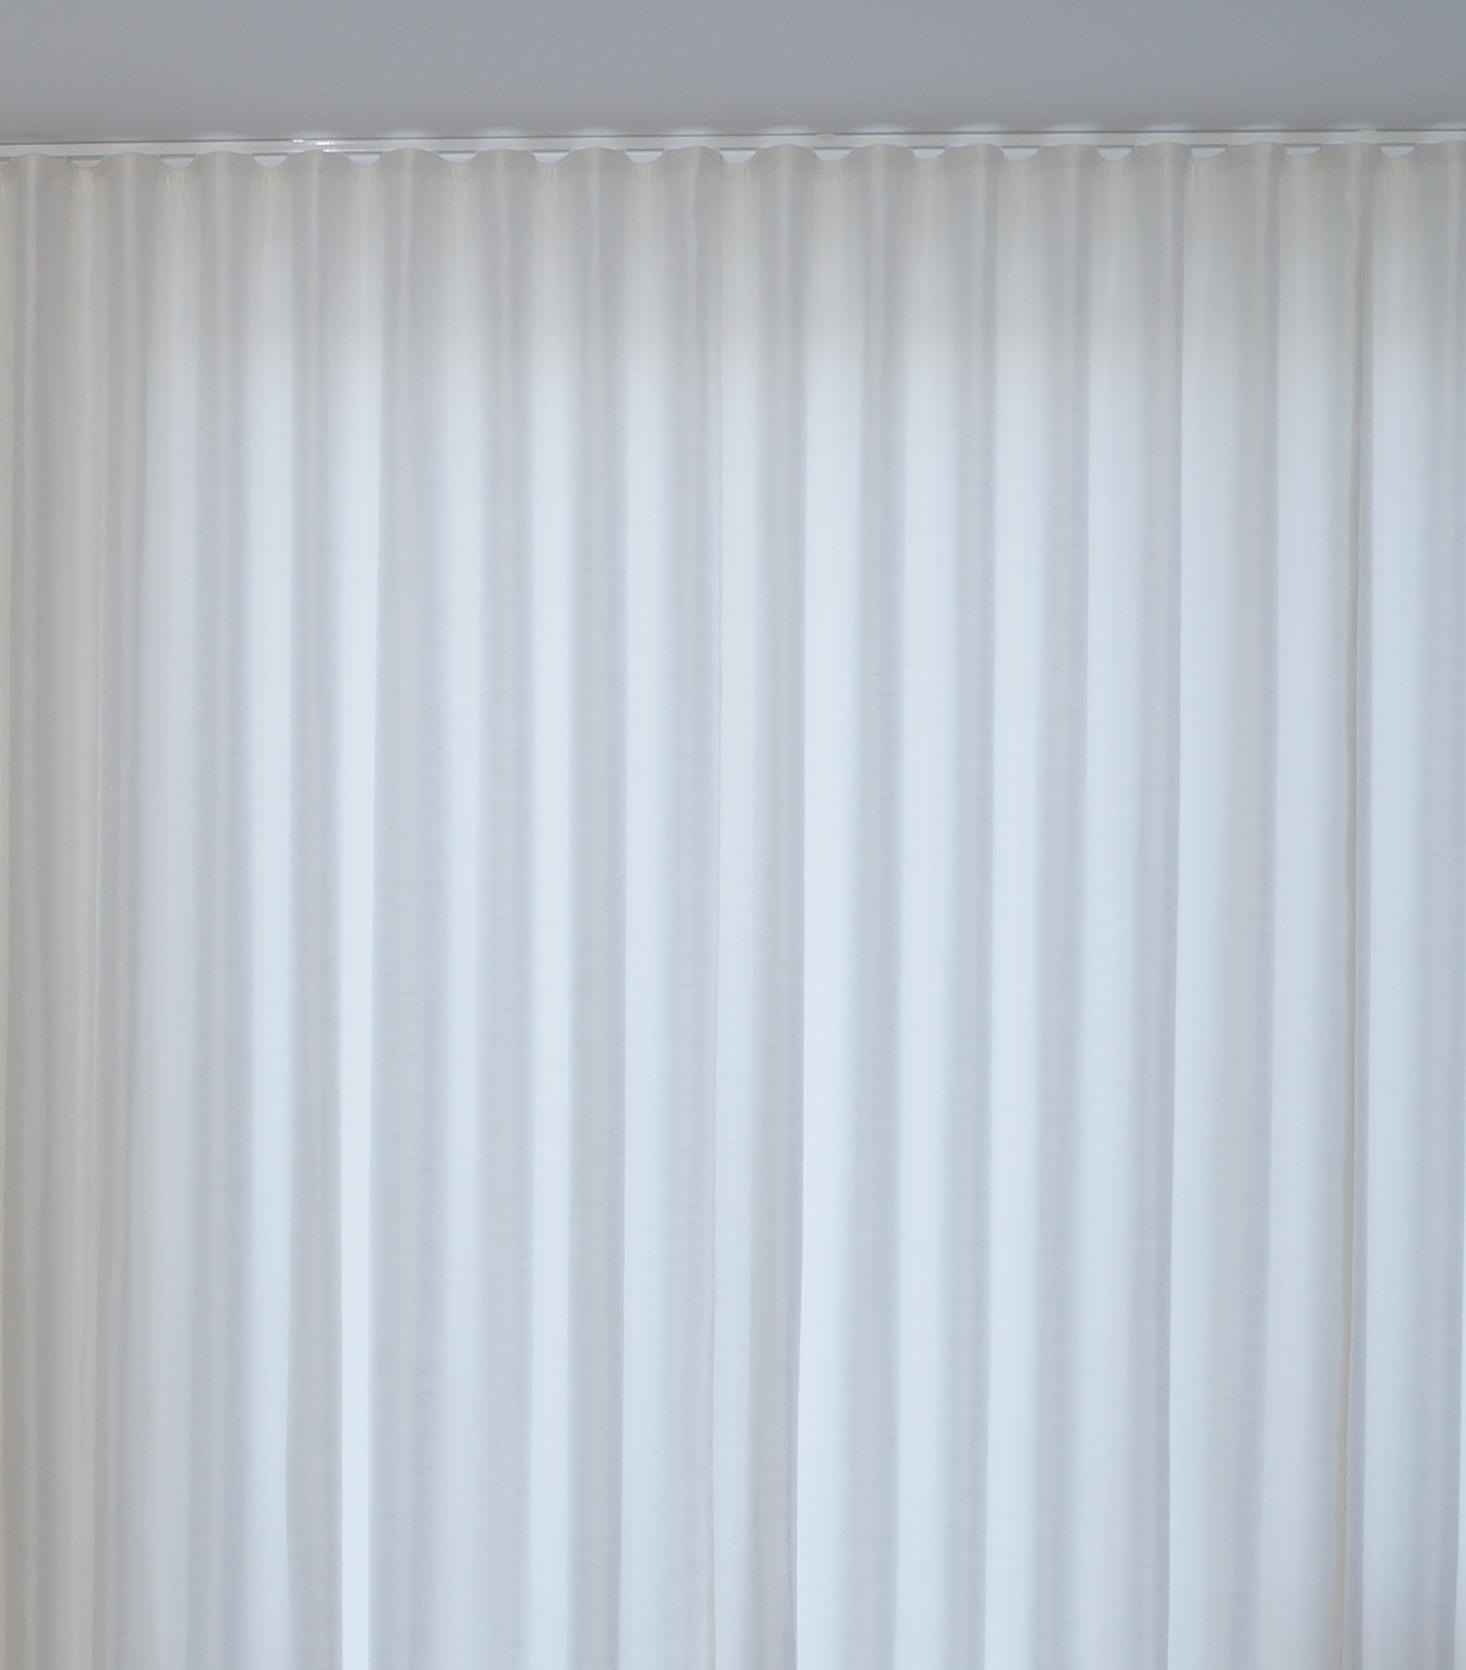 Curtain Heading SFold 3.jpg